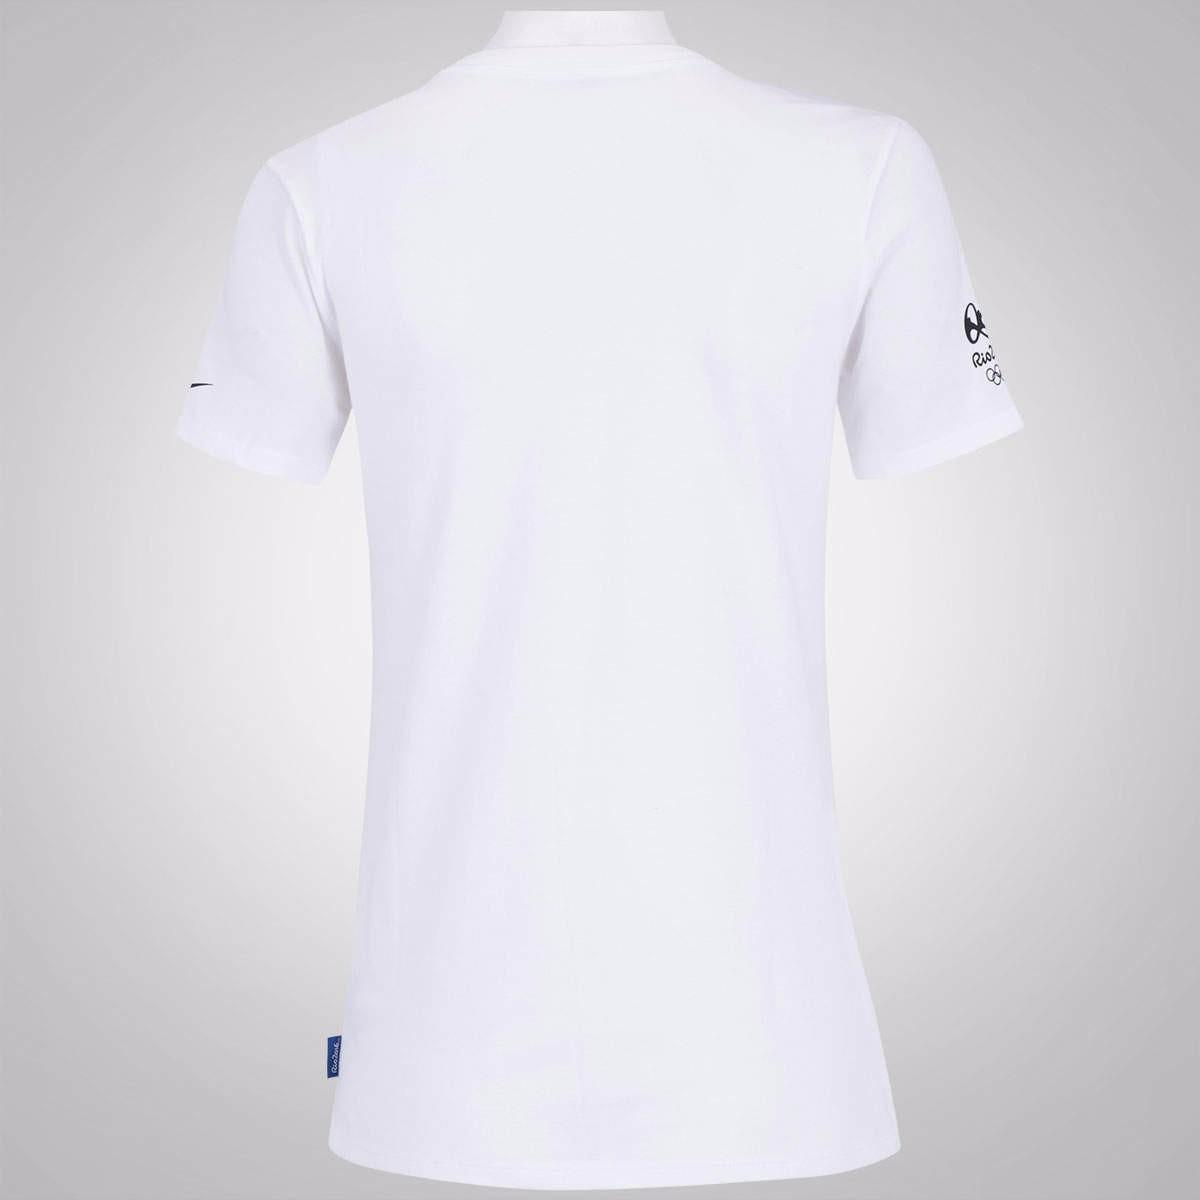 a5c84a907b camiseta nike manga curta sportswear rio16 original. Carregando zoom.